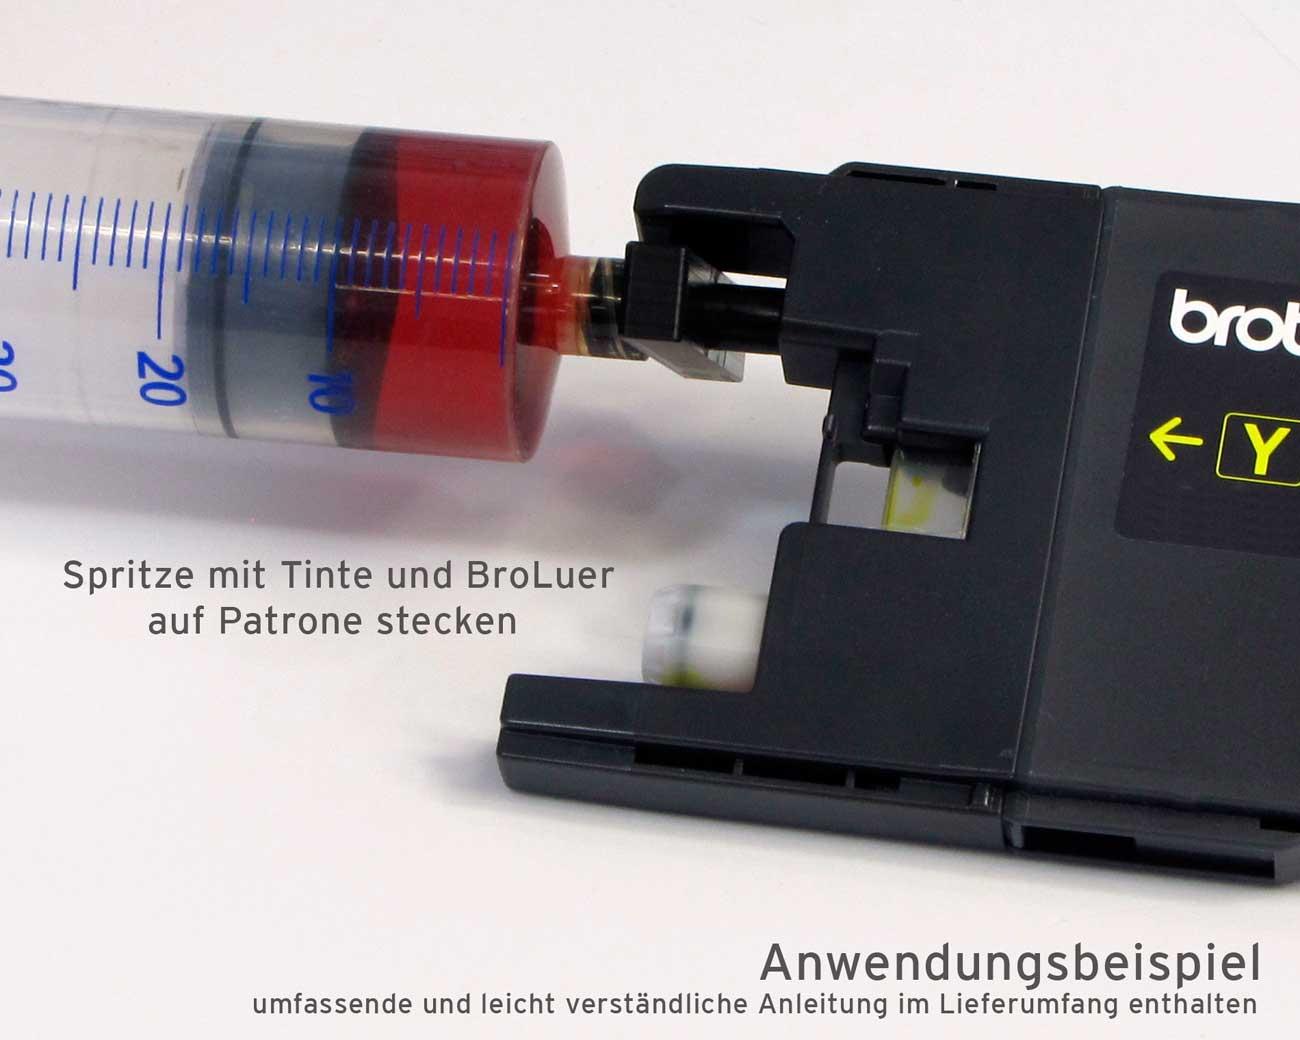 BroLuer Refill Adapter für Brother Patronen inkl. Spritze